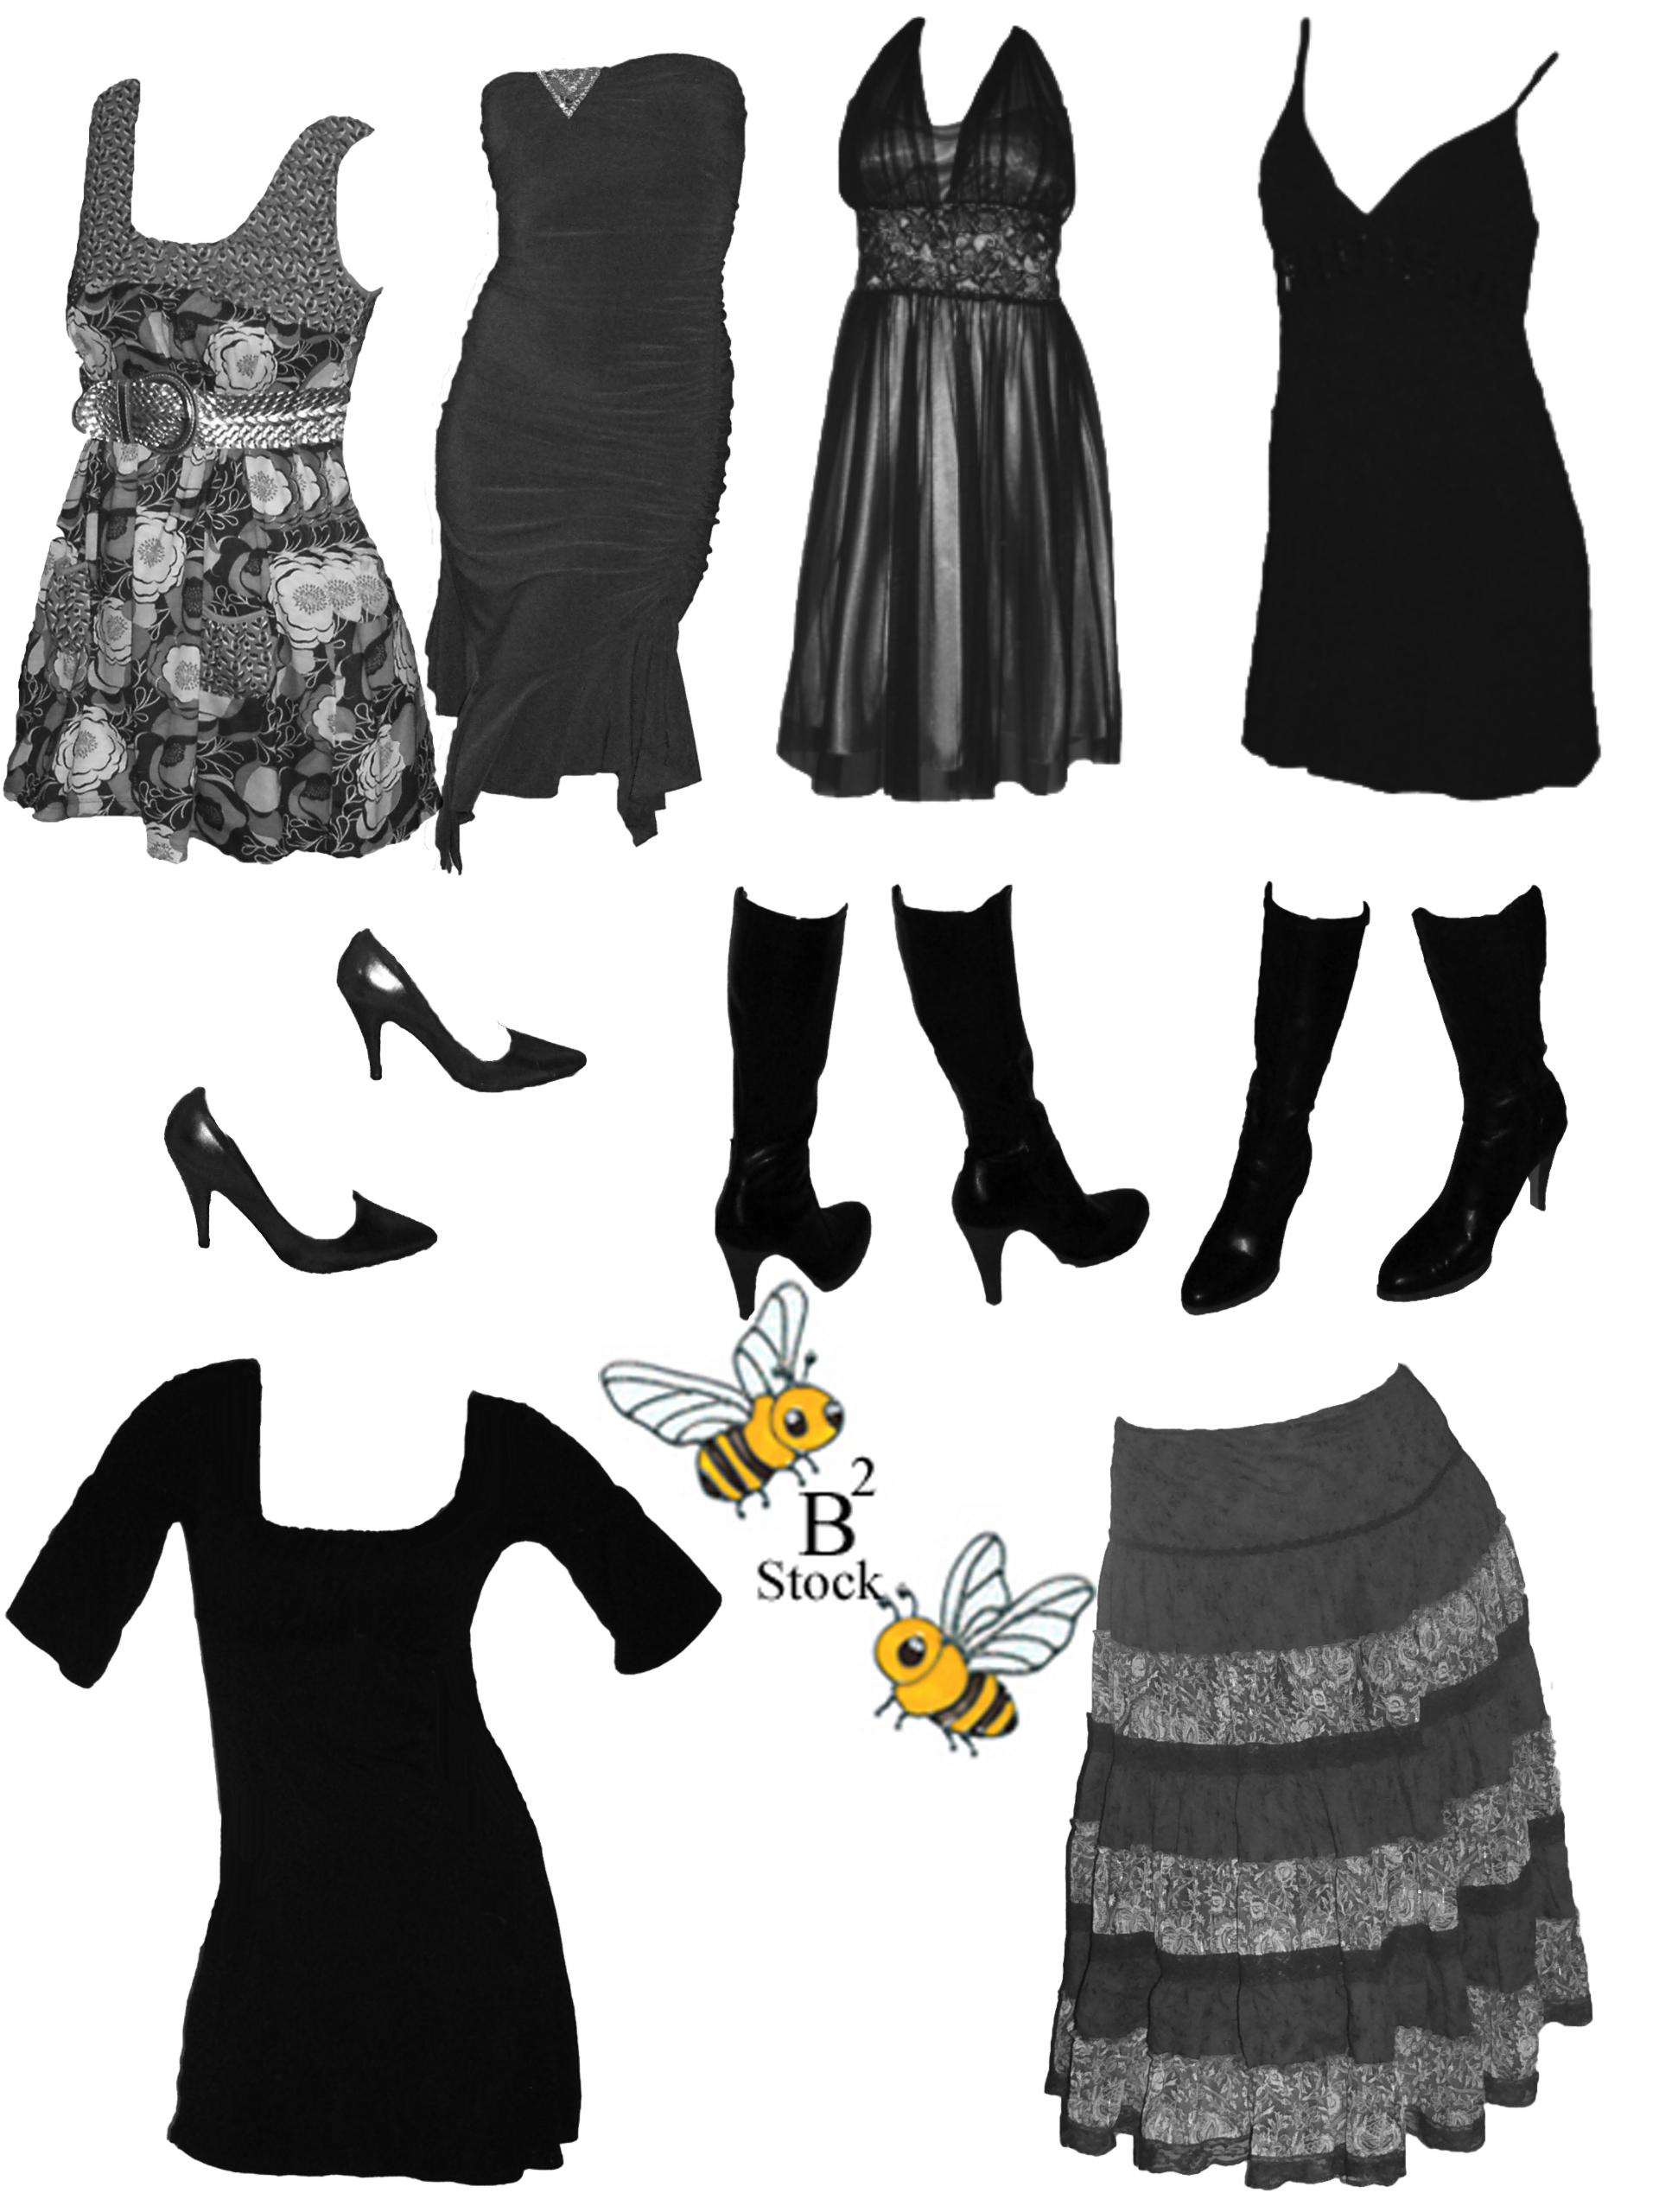 кисти для фотошопа одежда: